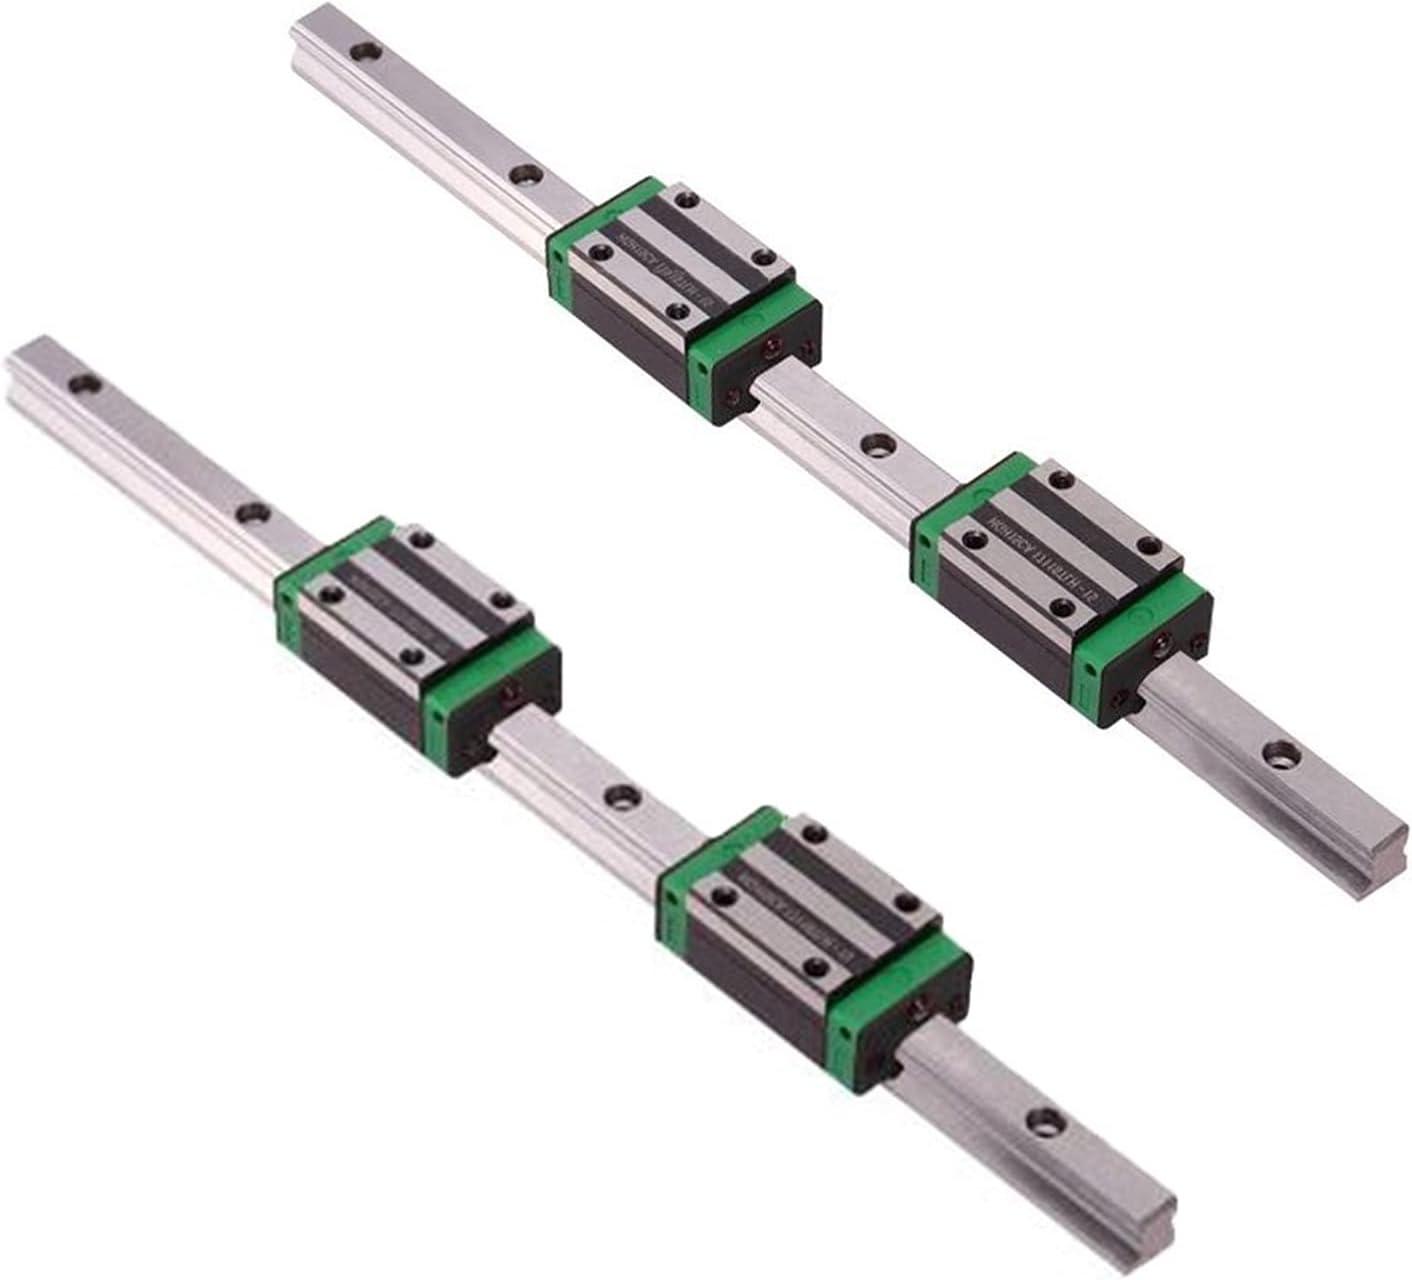 LIUXB-X 2PCS HGR20 Max 52% OFF HGR15 Square SEAL limited product Guide Slide Linear Bea Rail+4PCS